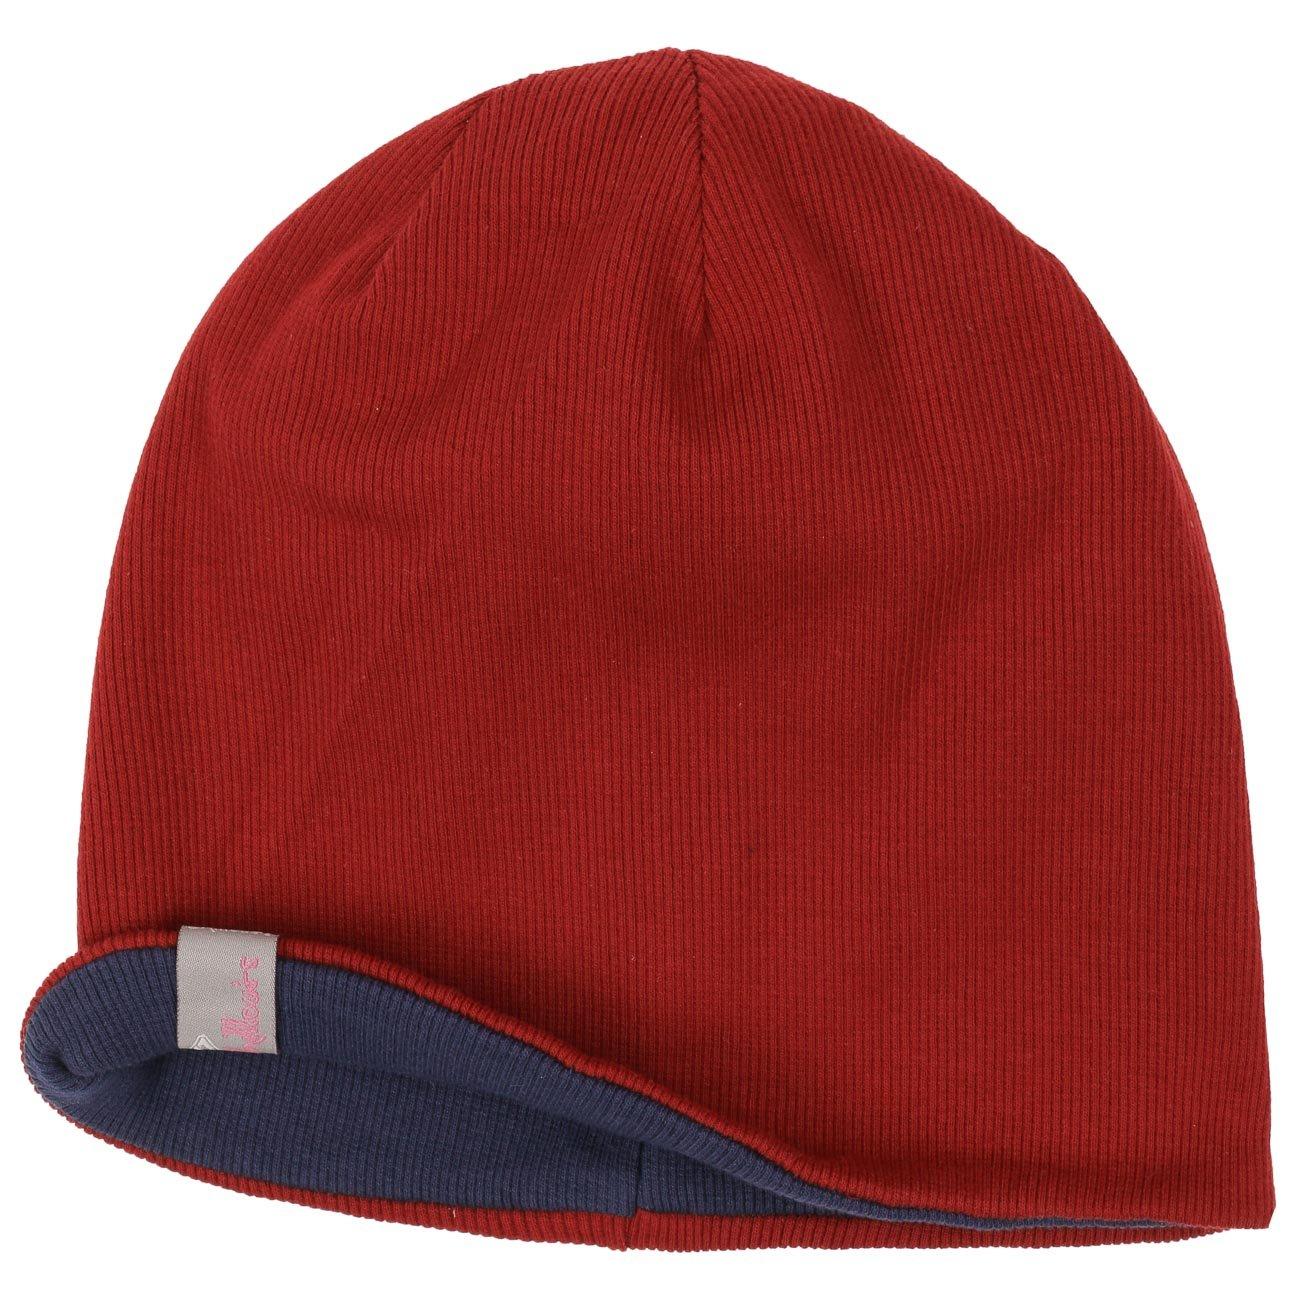 CHILLOUTS Cappello Unisex adulto Brooklyn Hat 437  1540970147-104702 ... b4ef3fbb32b1